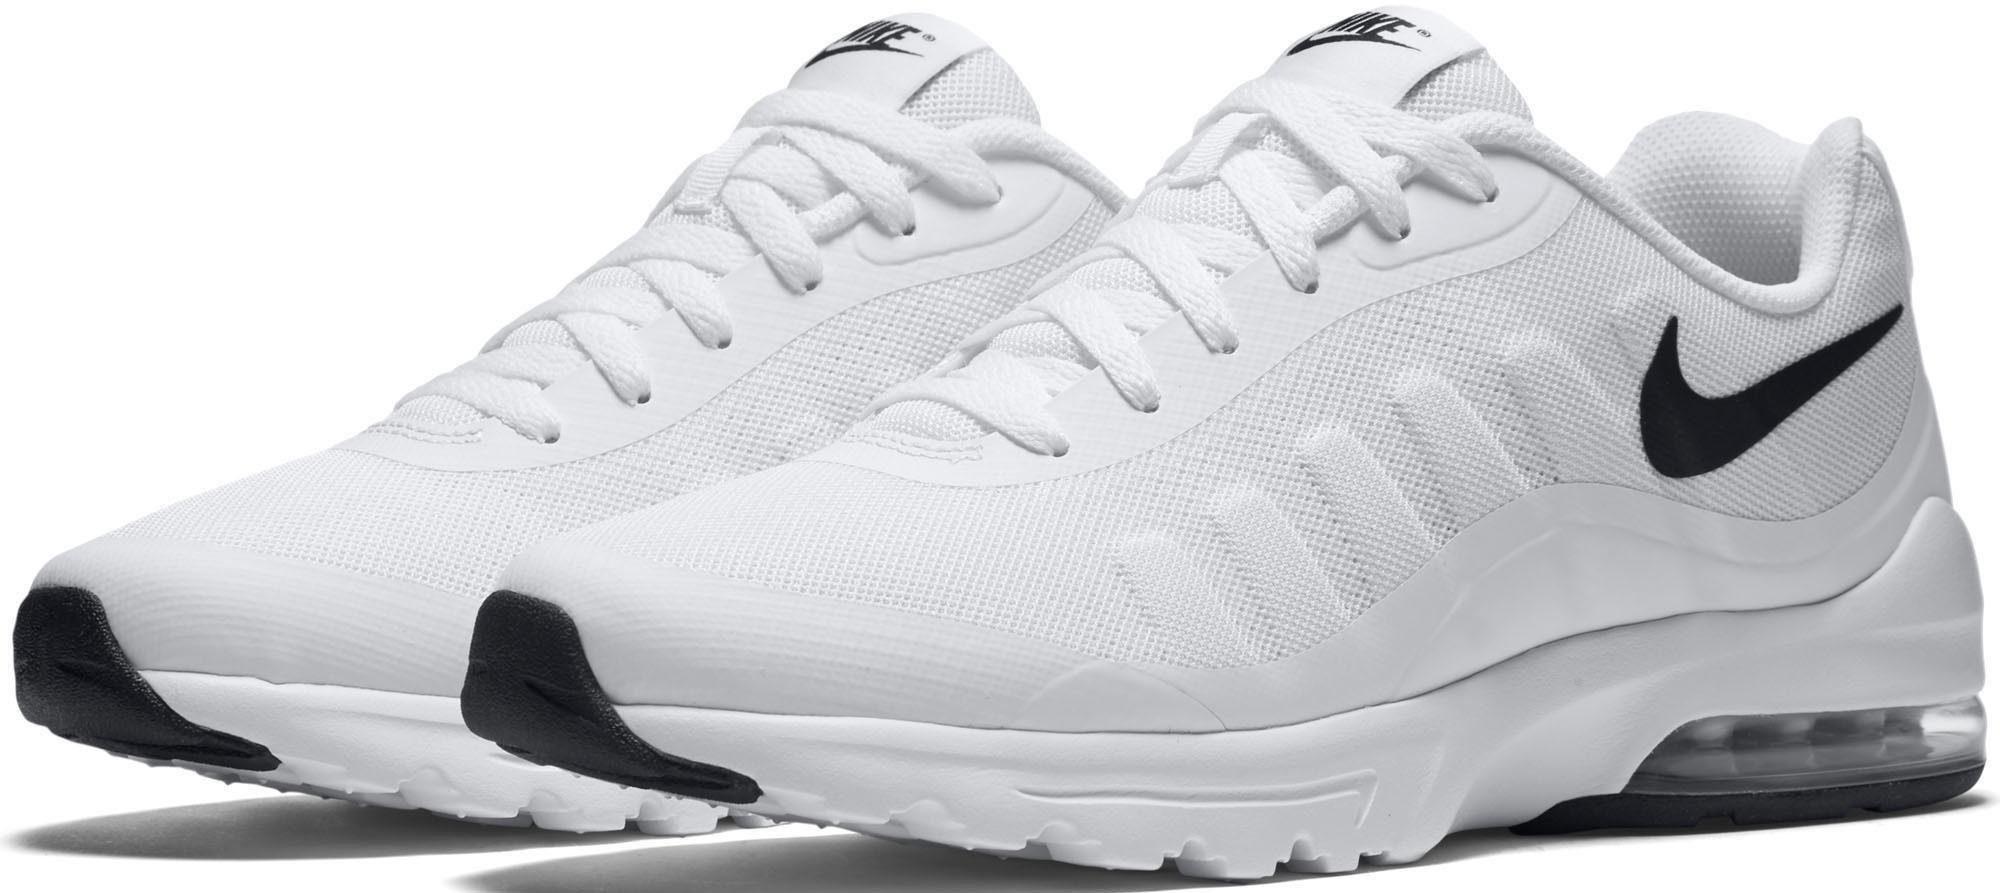 Sportswear Obermaterial Nike Max Mesh Online »air SneakerAtmungsaktives KaufenOtto Invigor« 0nOkX8Pw